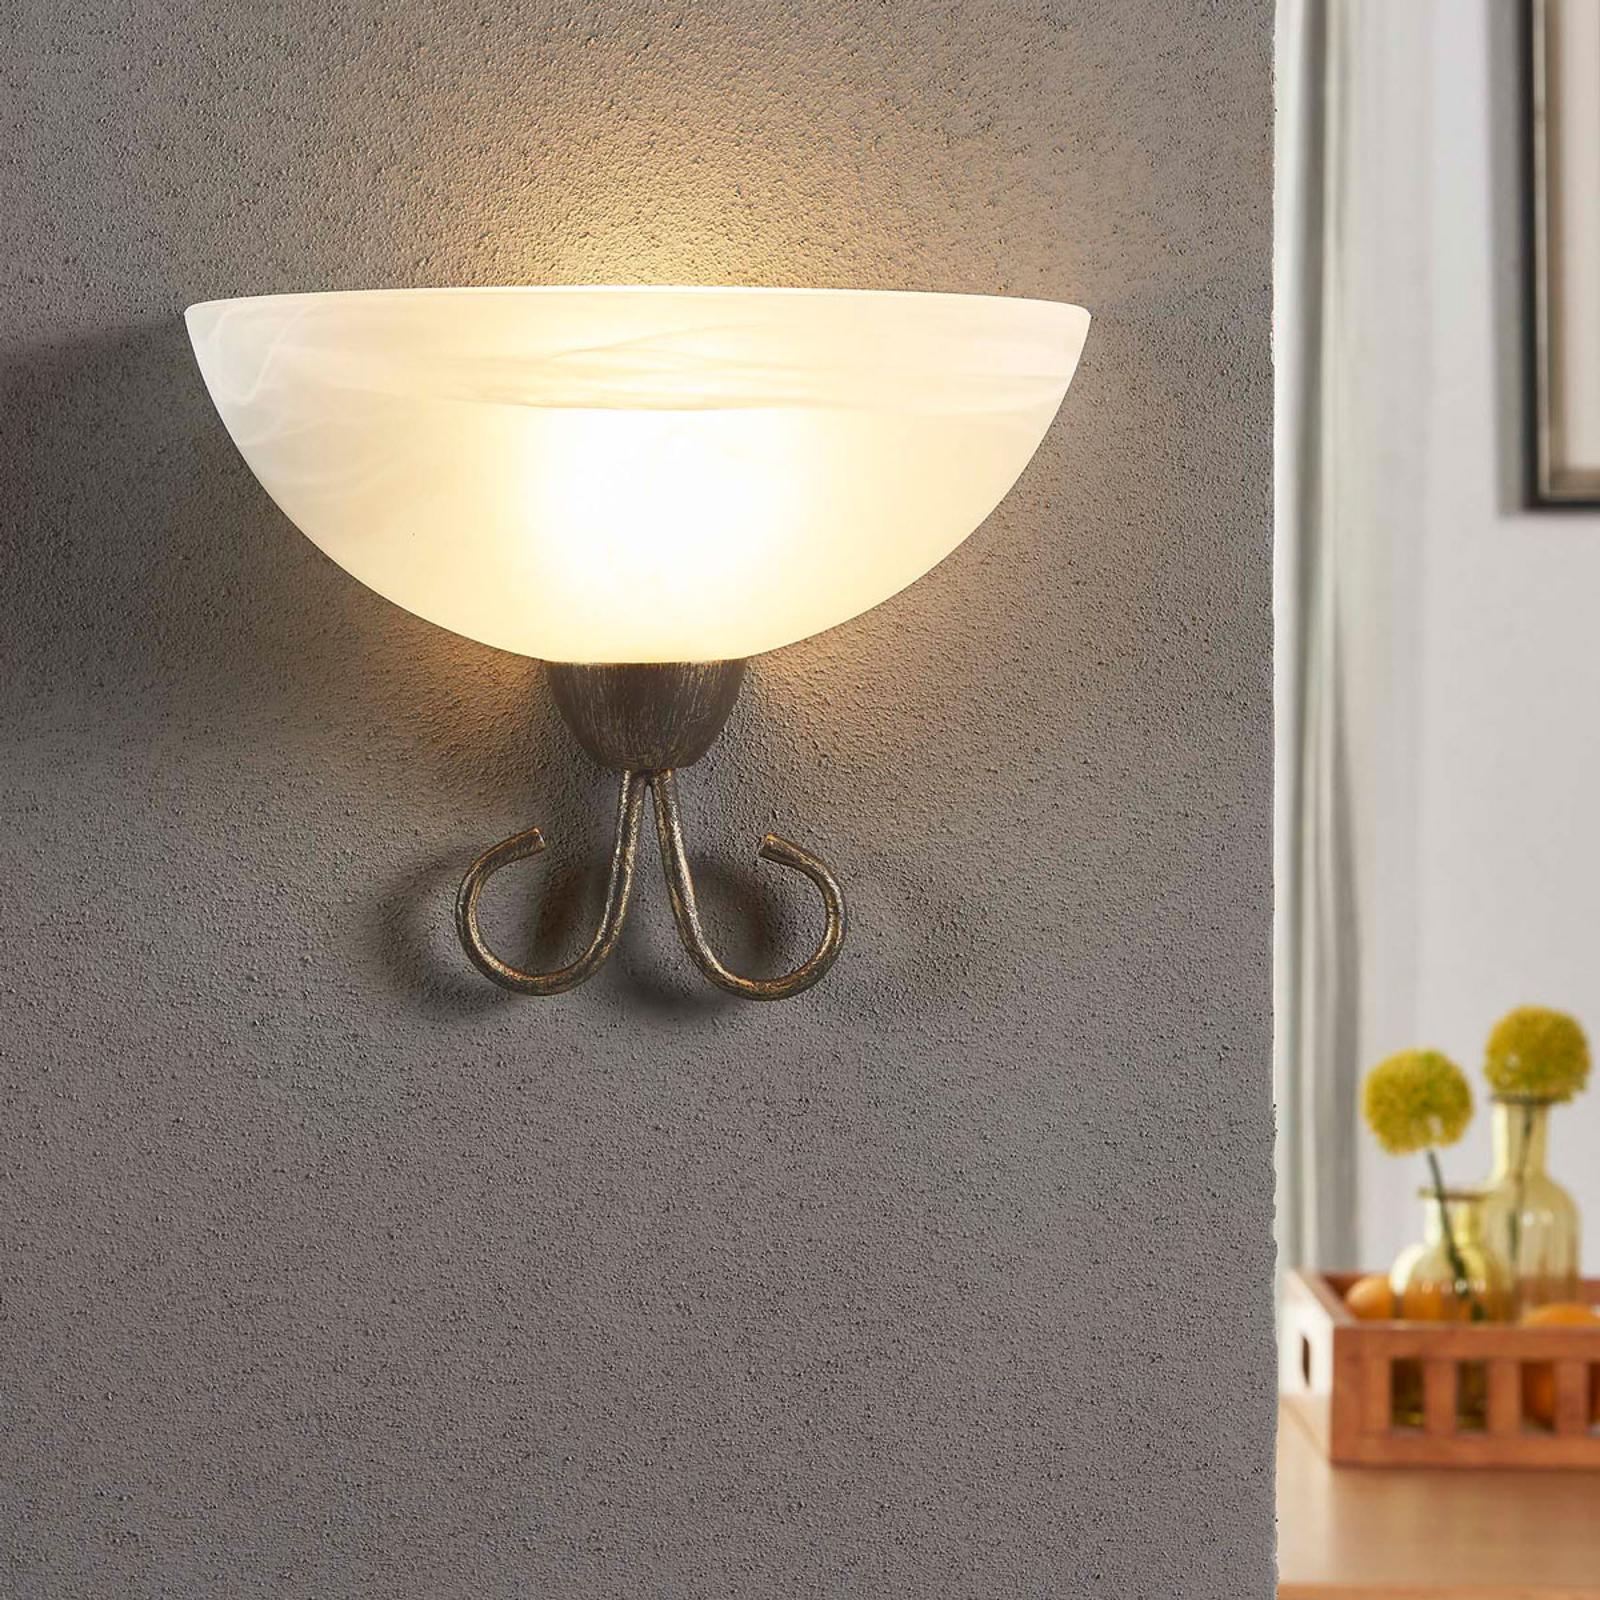 Aantrekkelijke wandlamp Castila